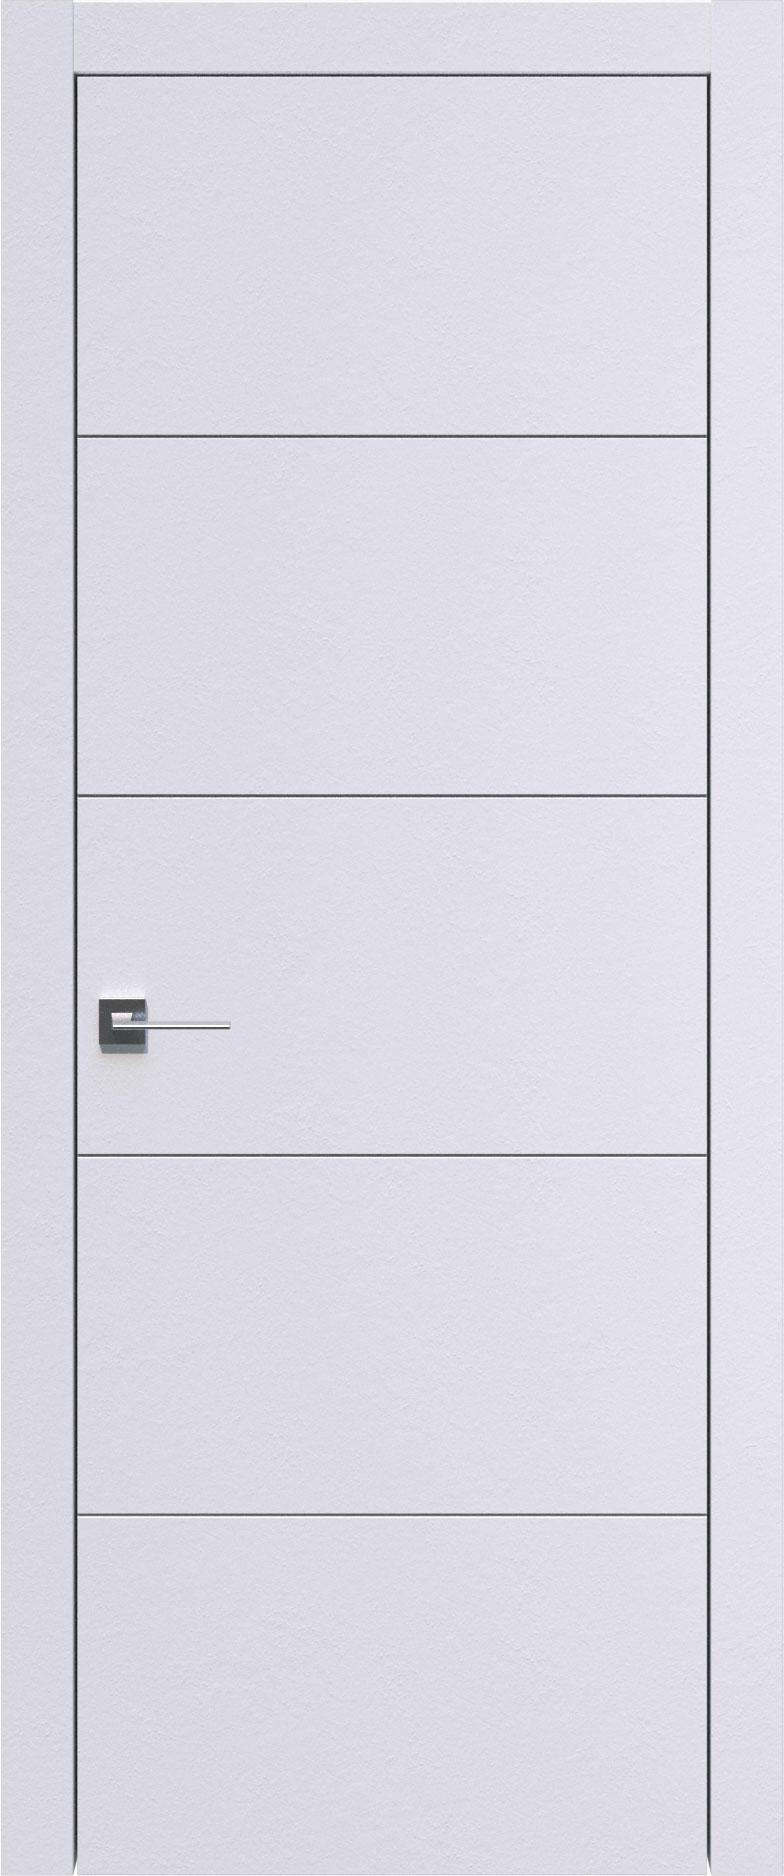 Tivoli Д-2 цвет - Арктик белый Без стекла (ДГ)